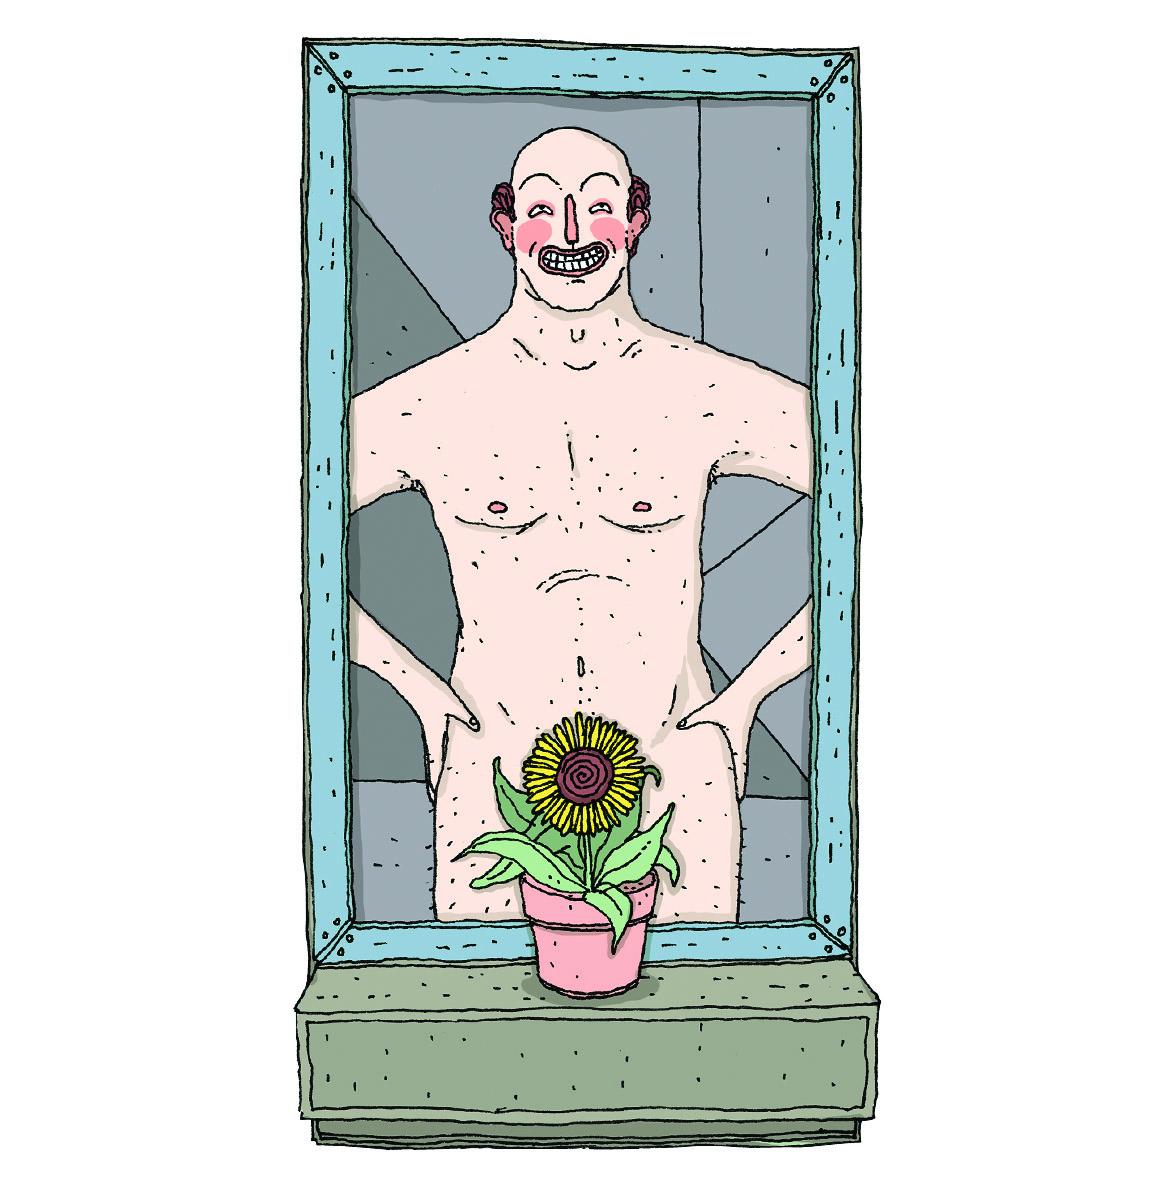 privacy illustration q&a